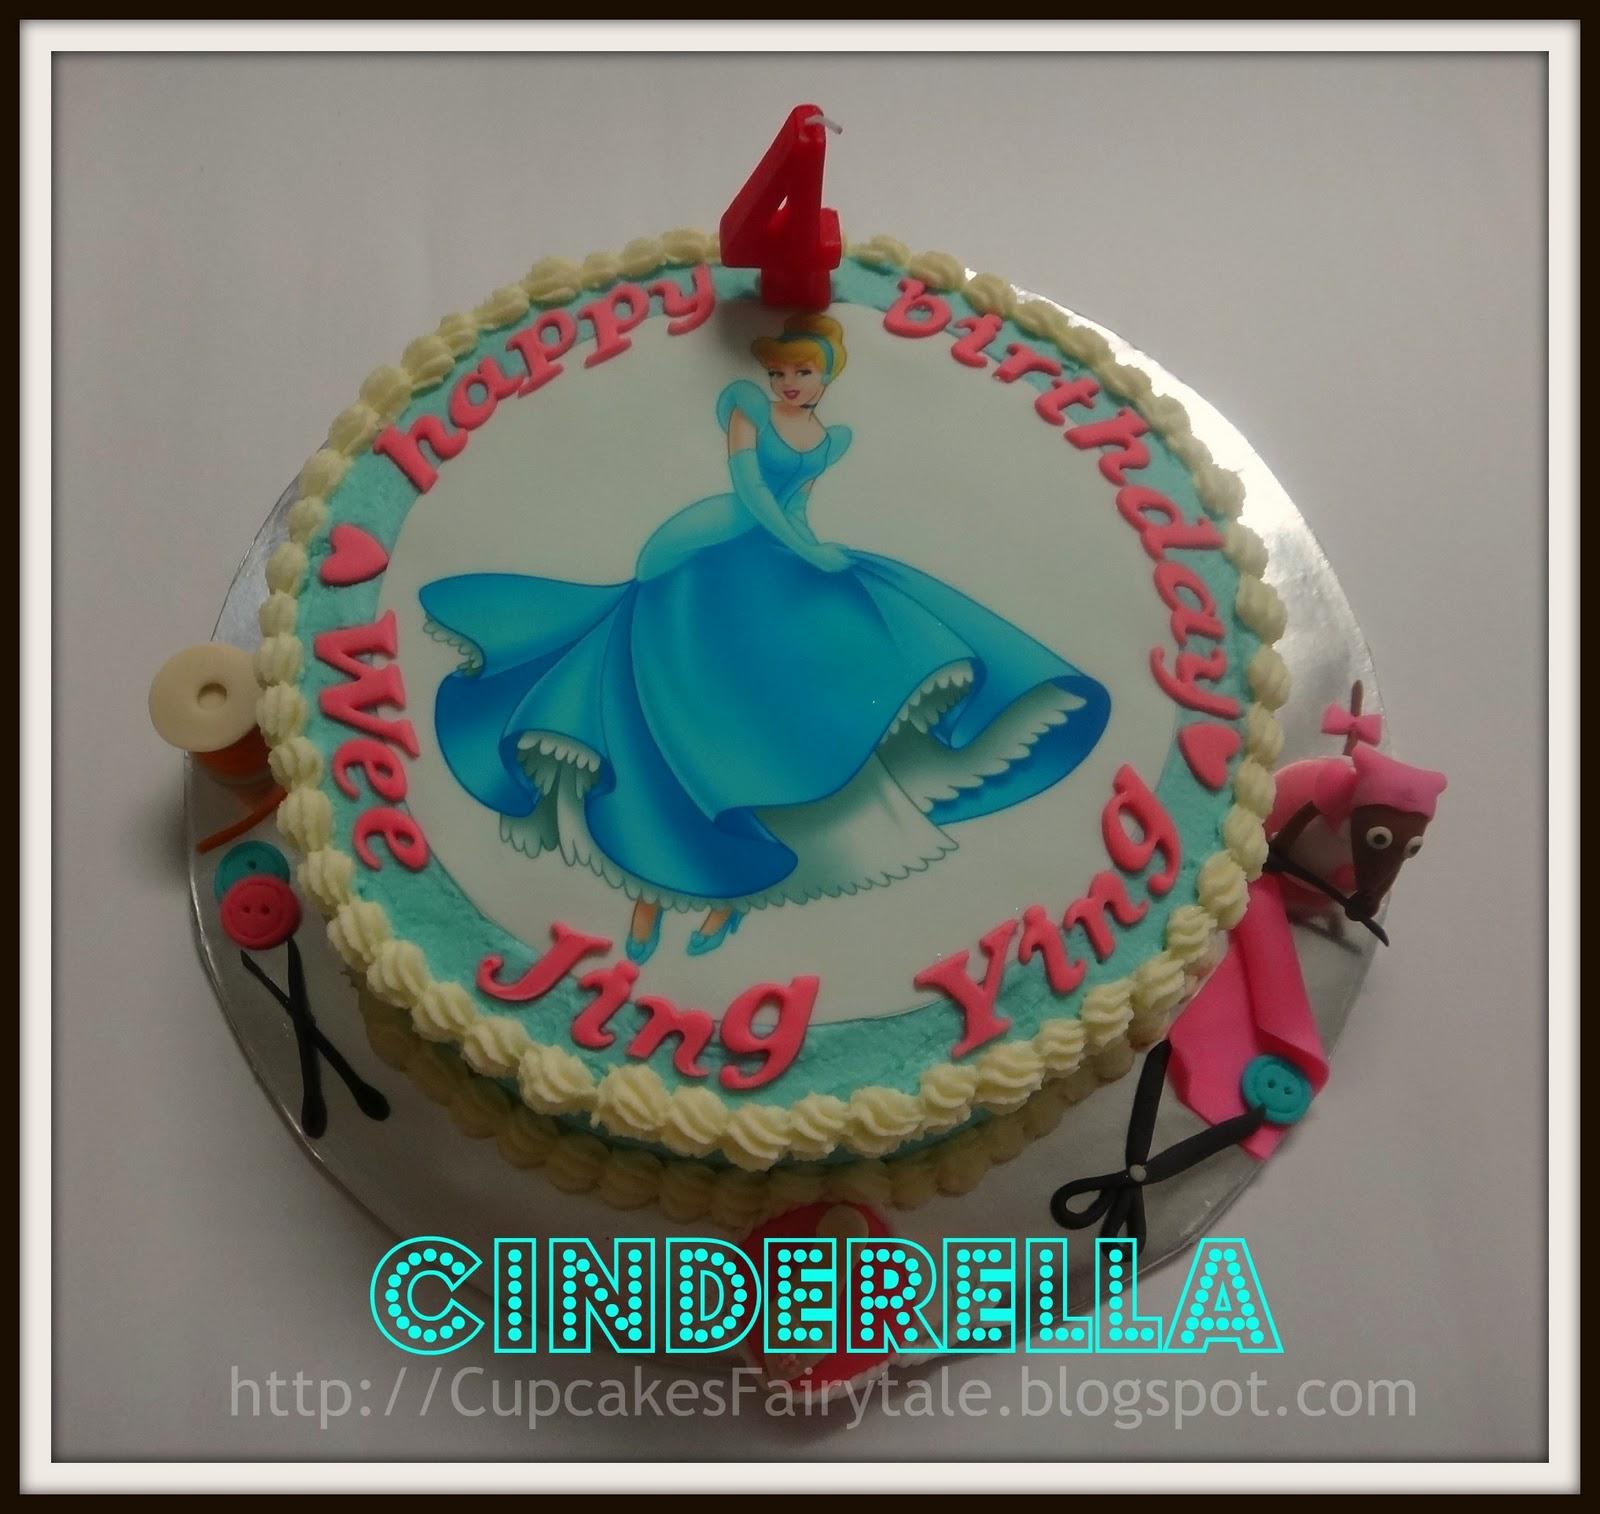 Cupcakes Fairytale Wee Jing Ying S Princess Cinderella